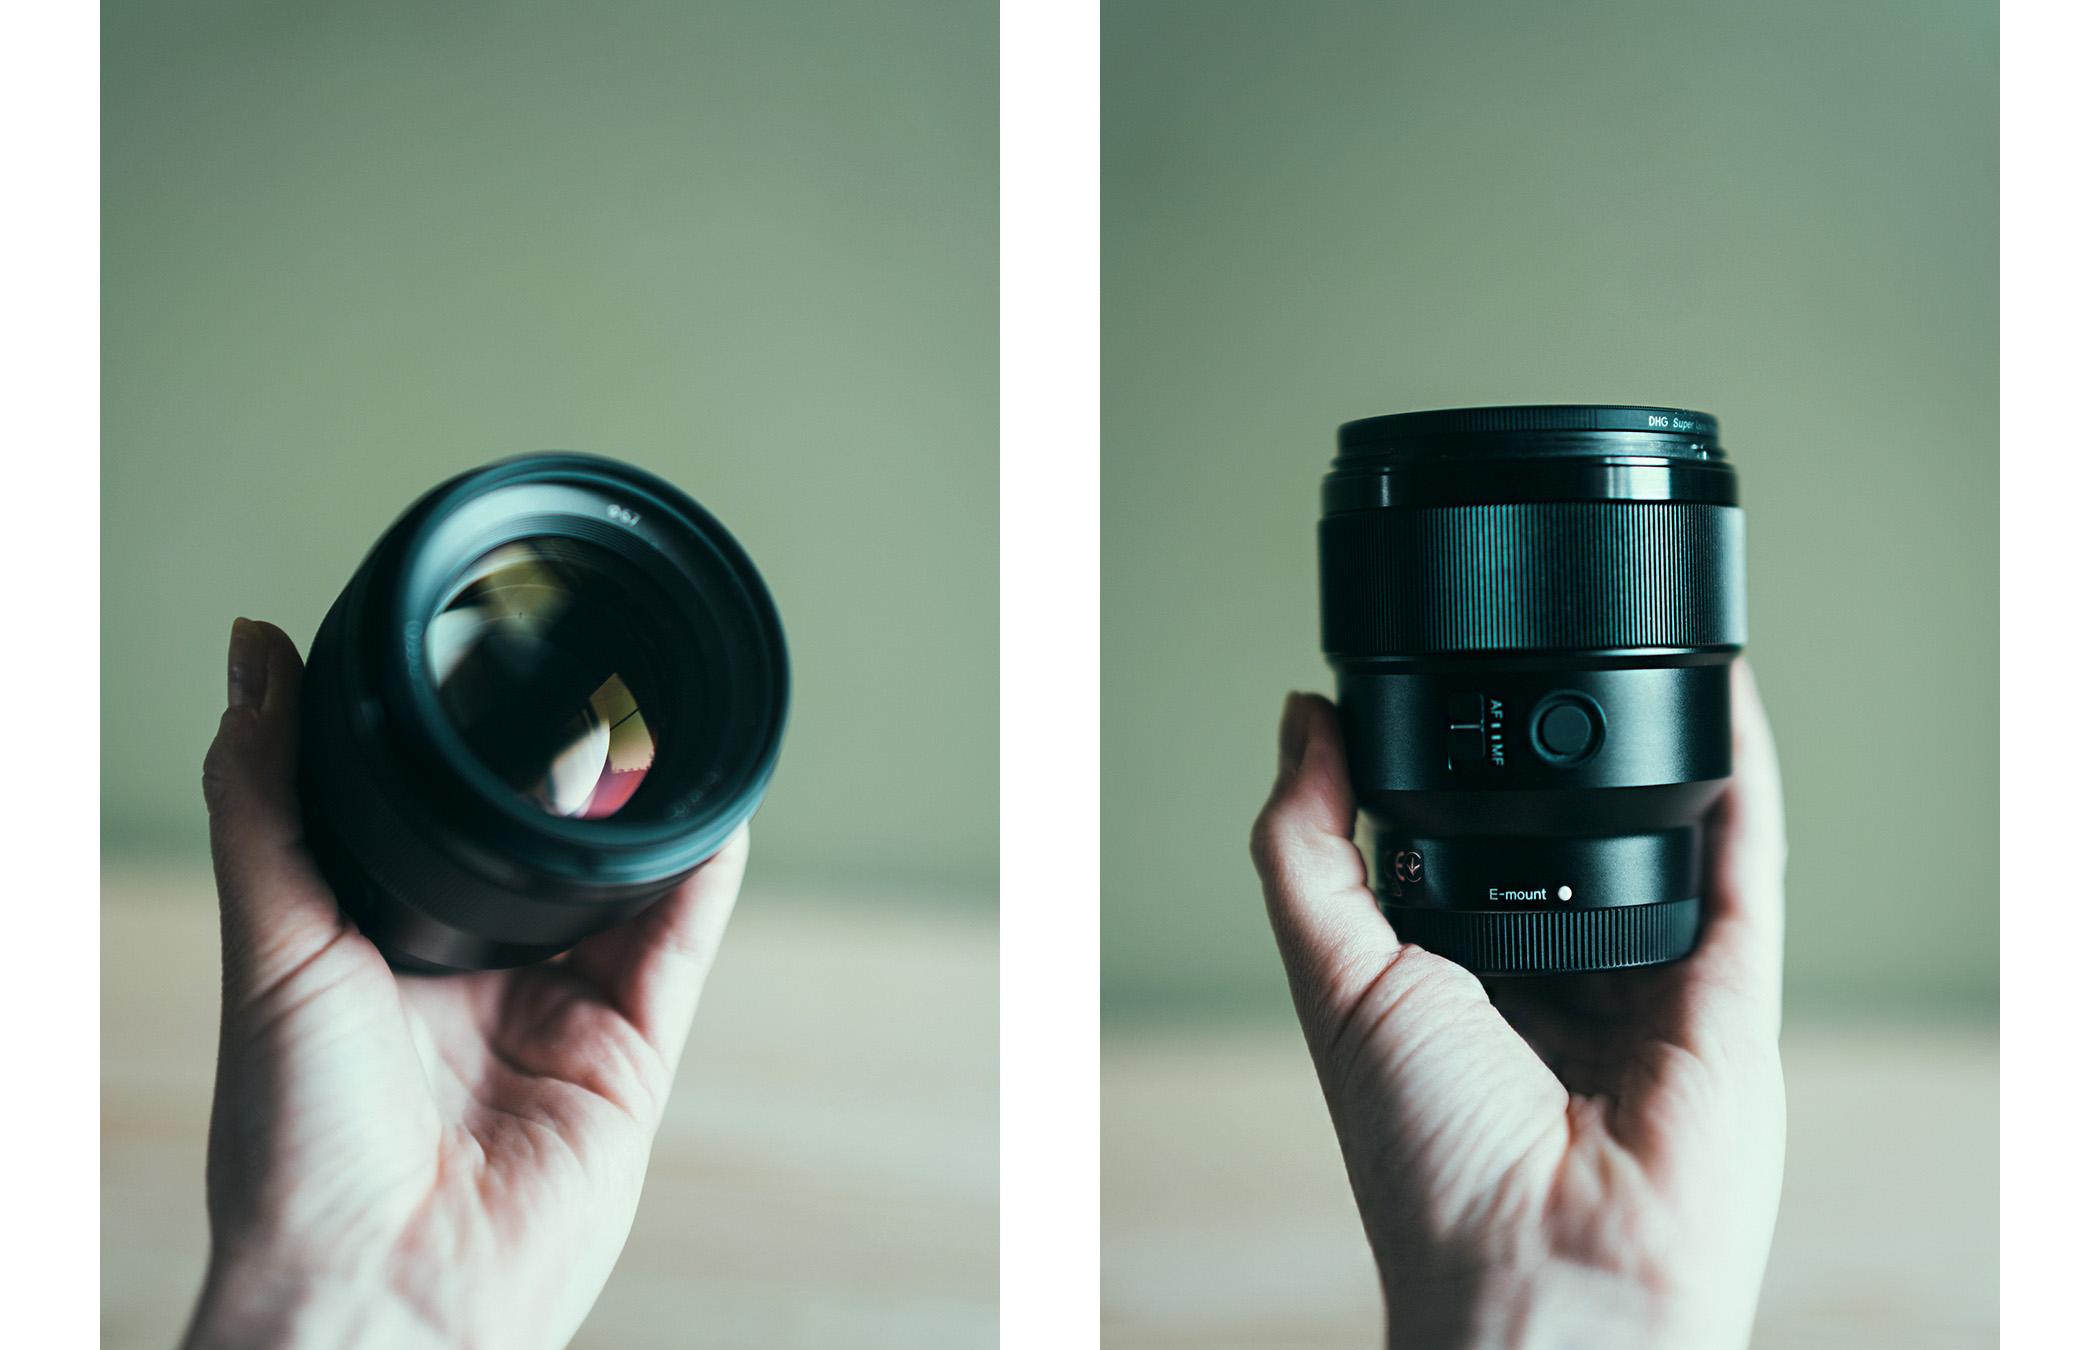 Sony 85 mm f/1.8